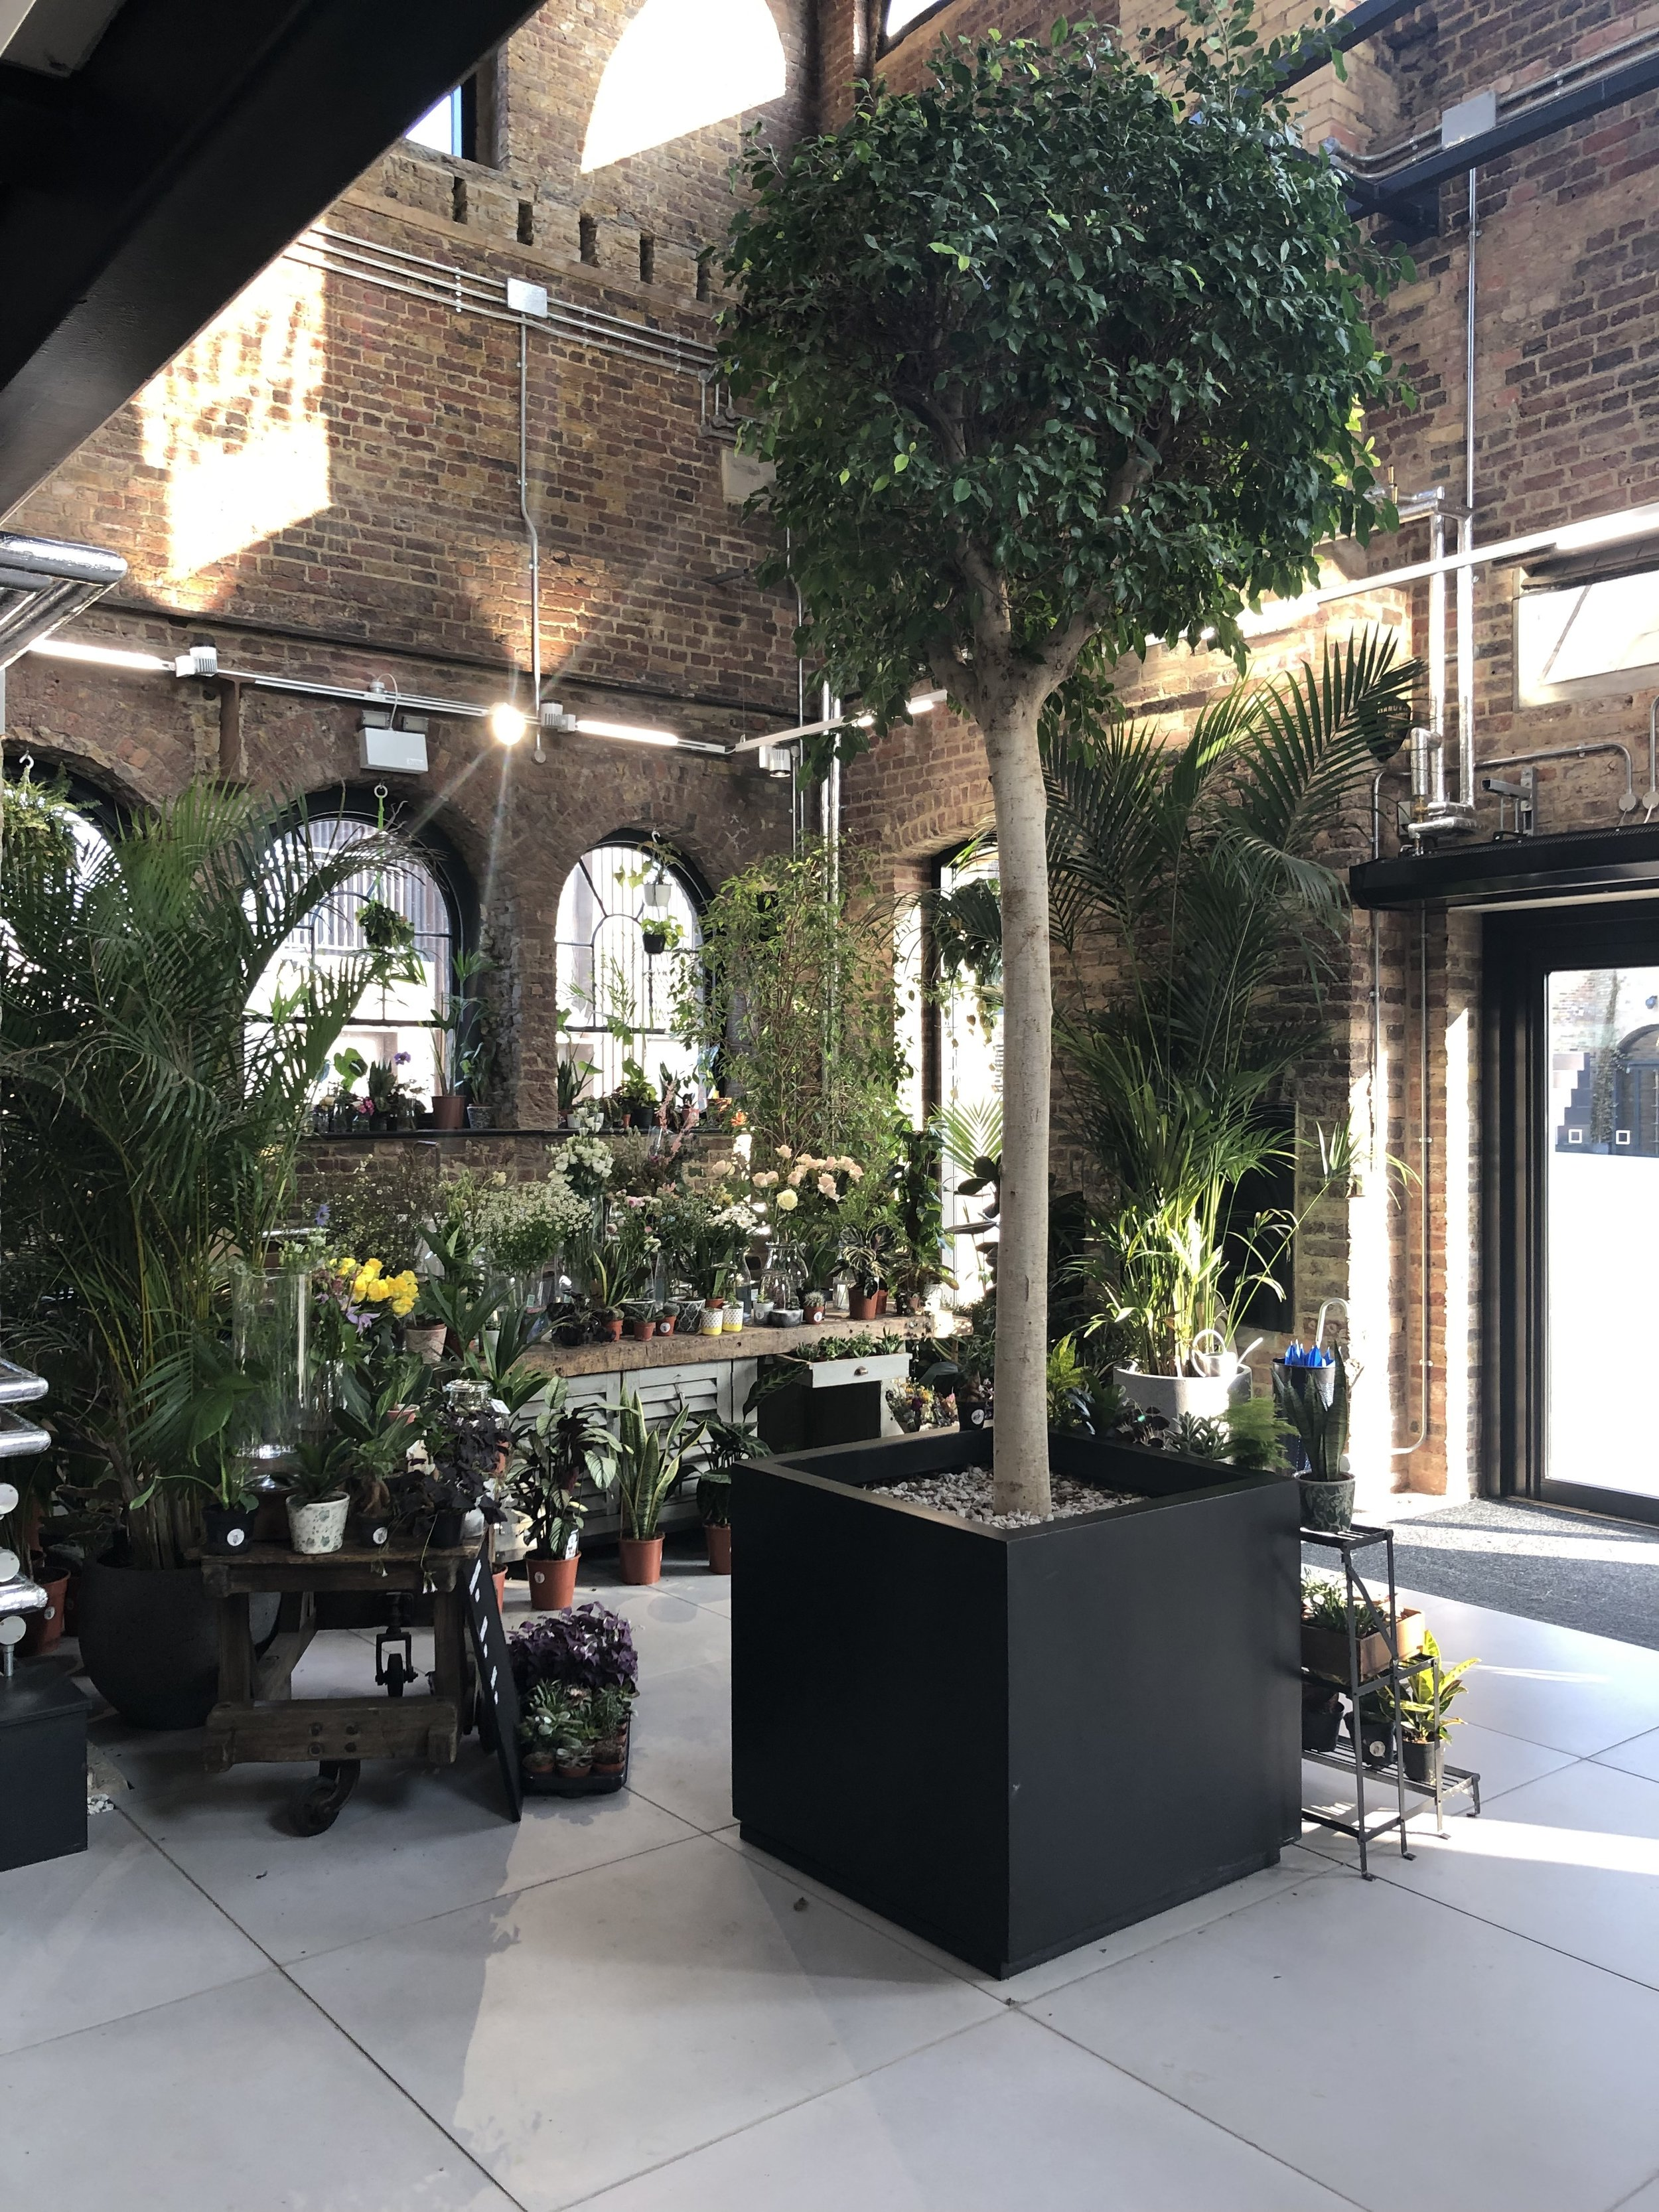 Glamorous_Living_coal_drops_yard_kings_cross_london_Doreen_Chambers_luxury_interior_design_Brooklyn_New_York_Fort_Lauderdale_Miami